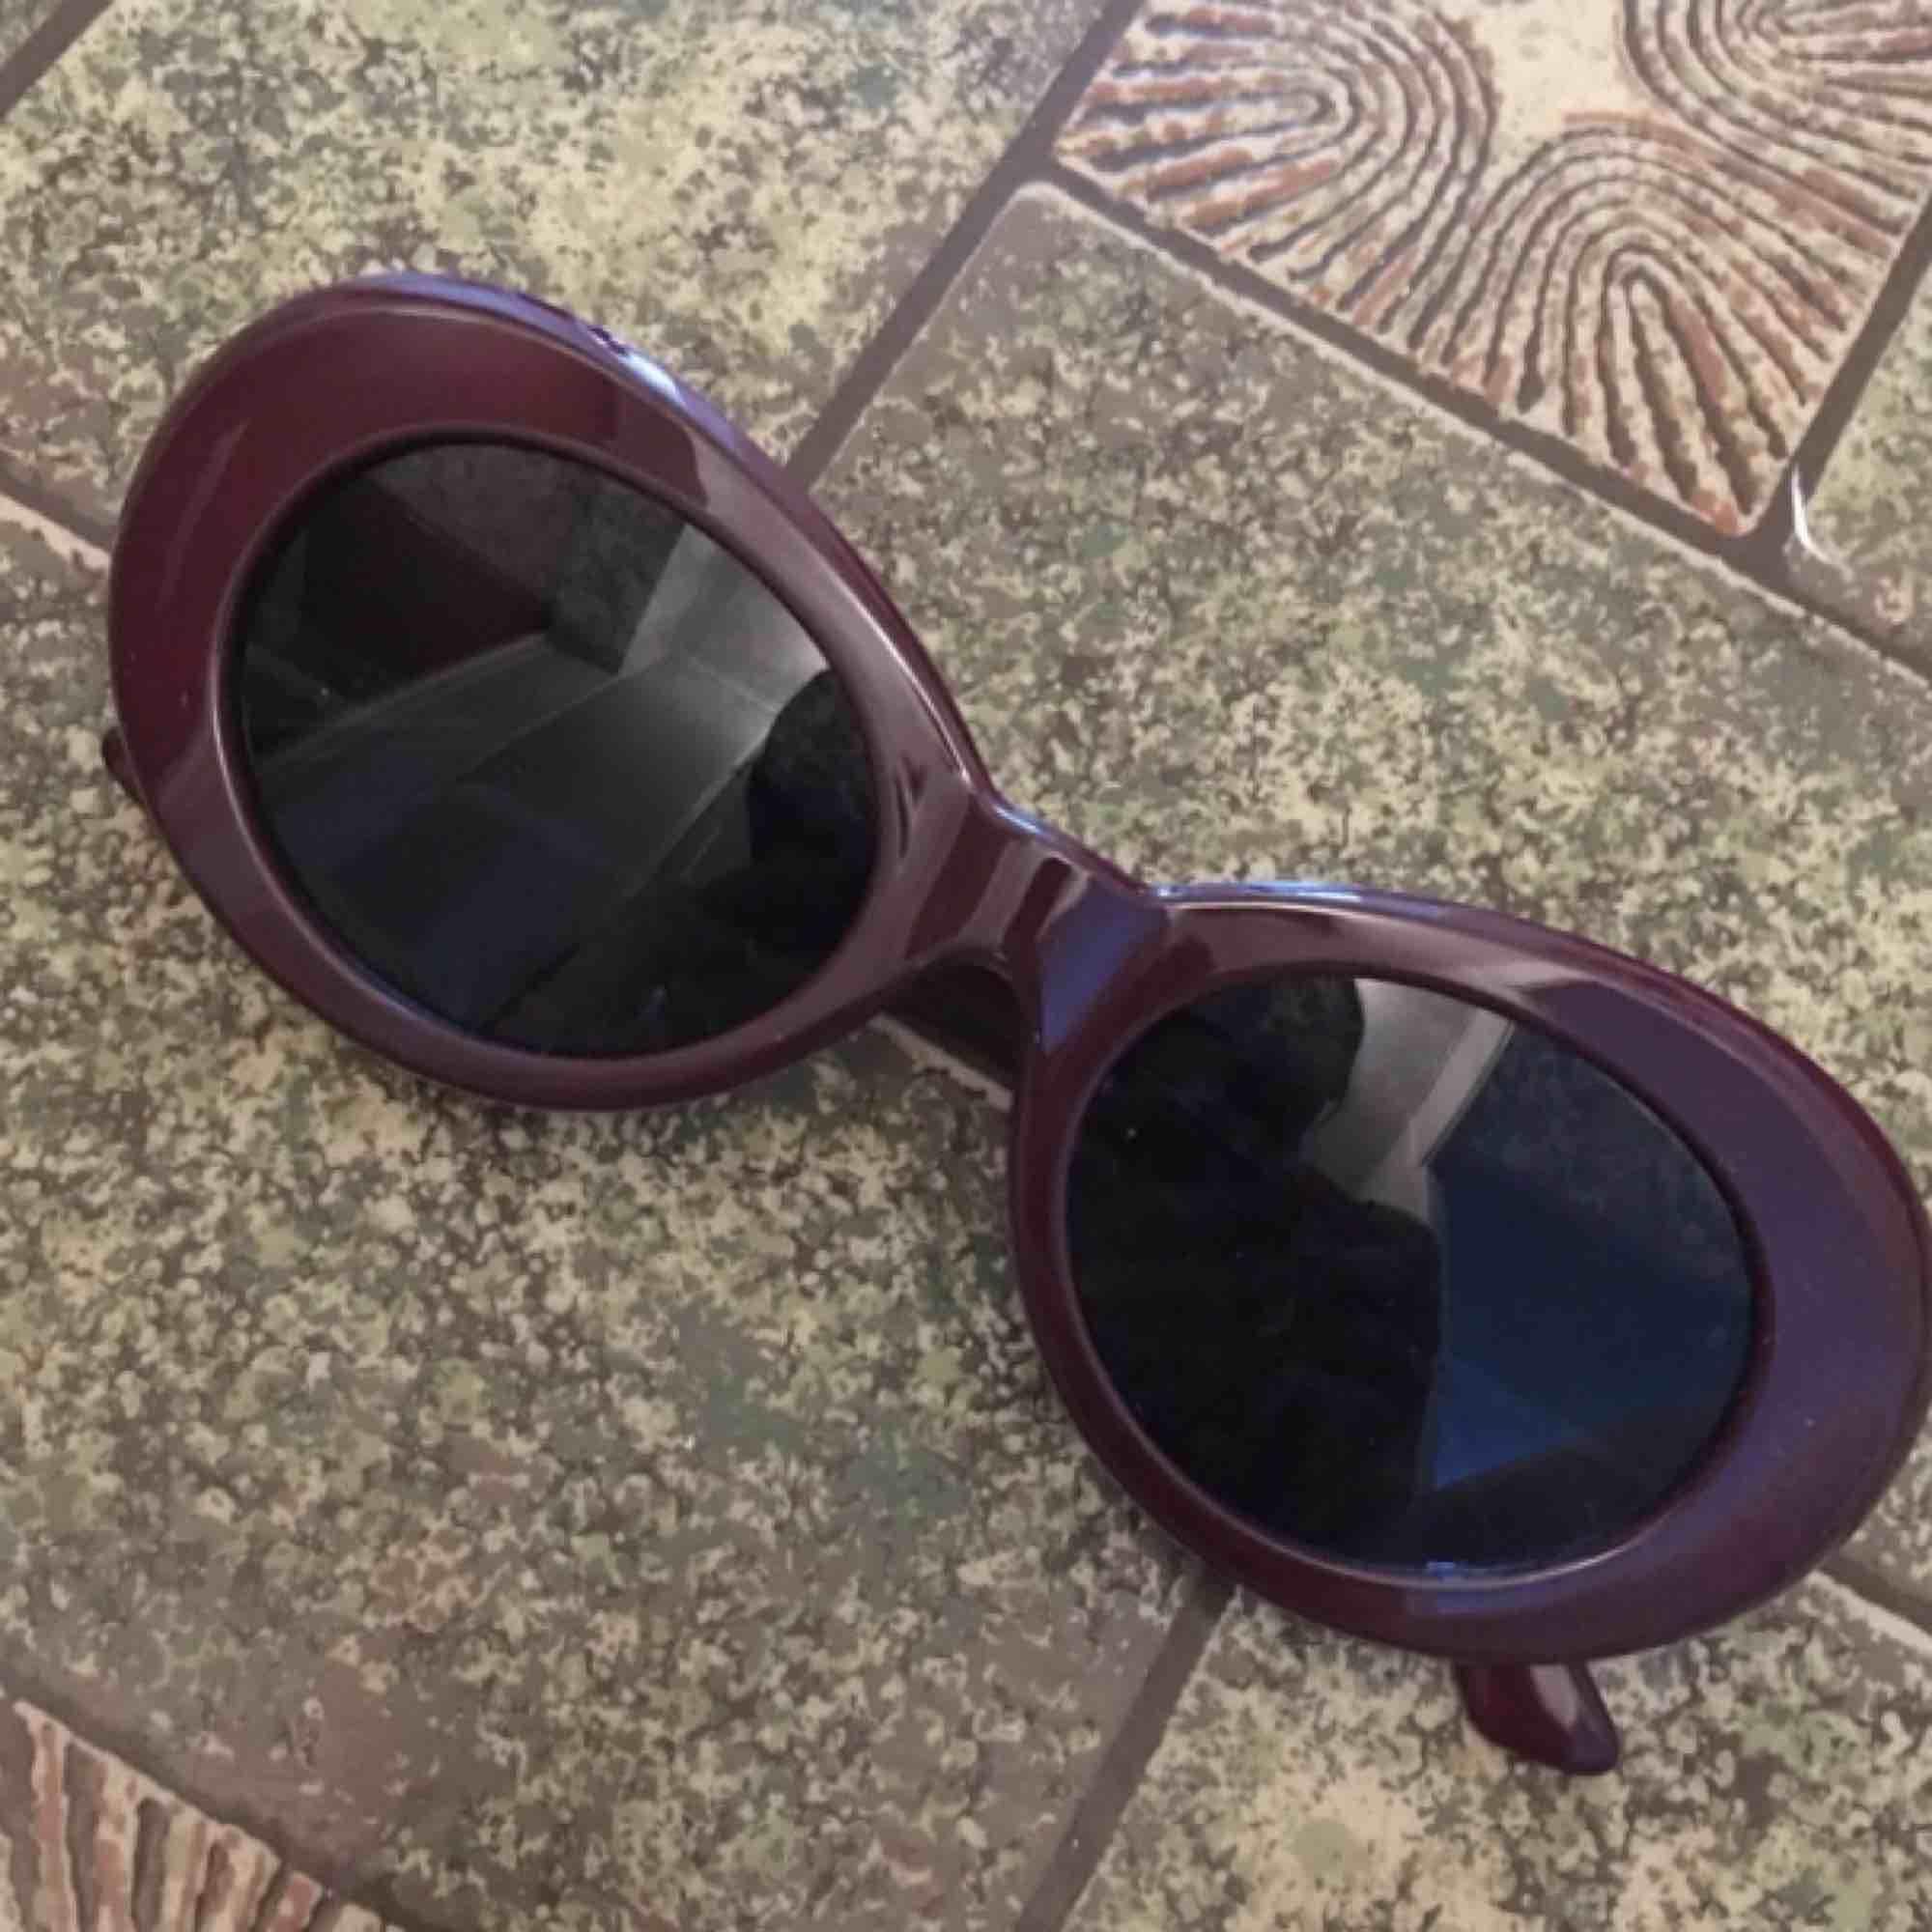 Nya solglasögon 🌞 frakt 18kr. Accessoarer.